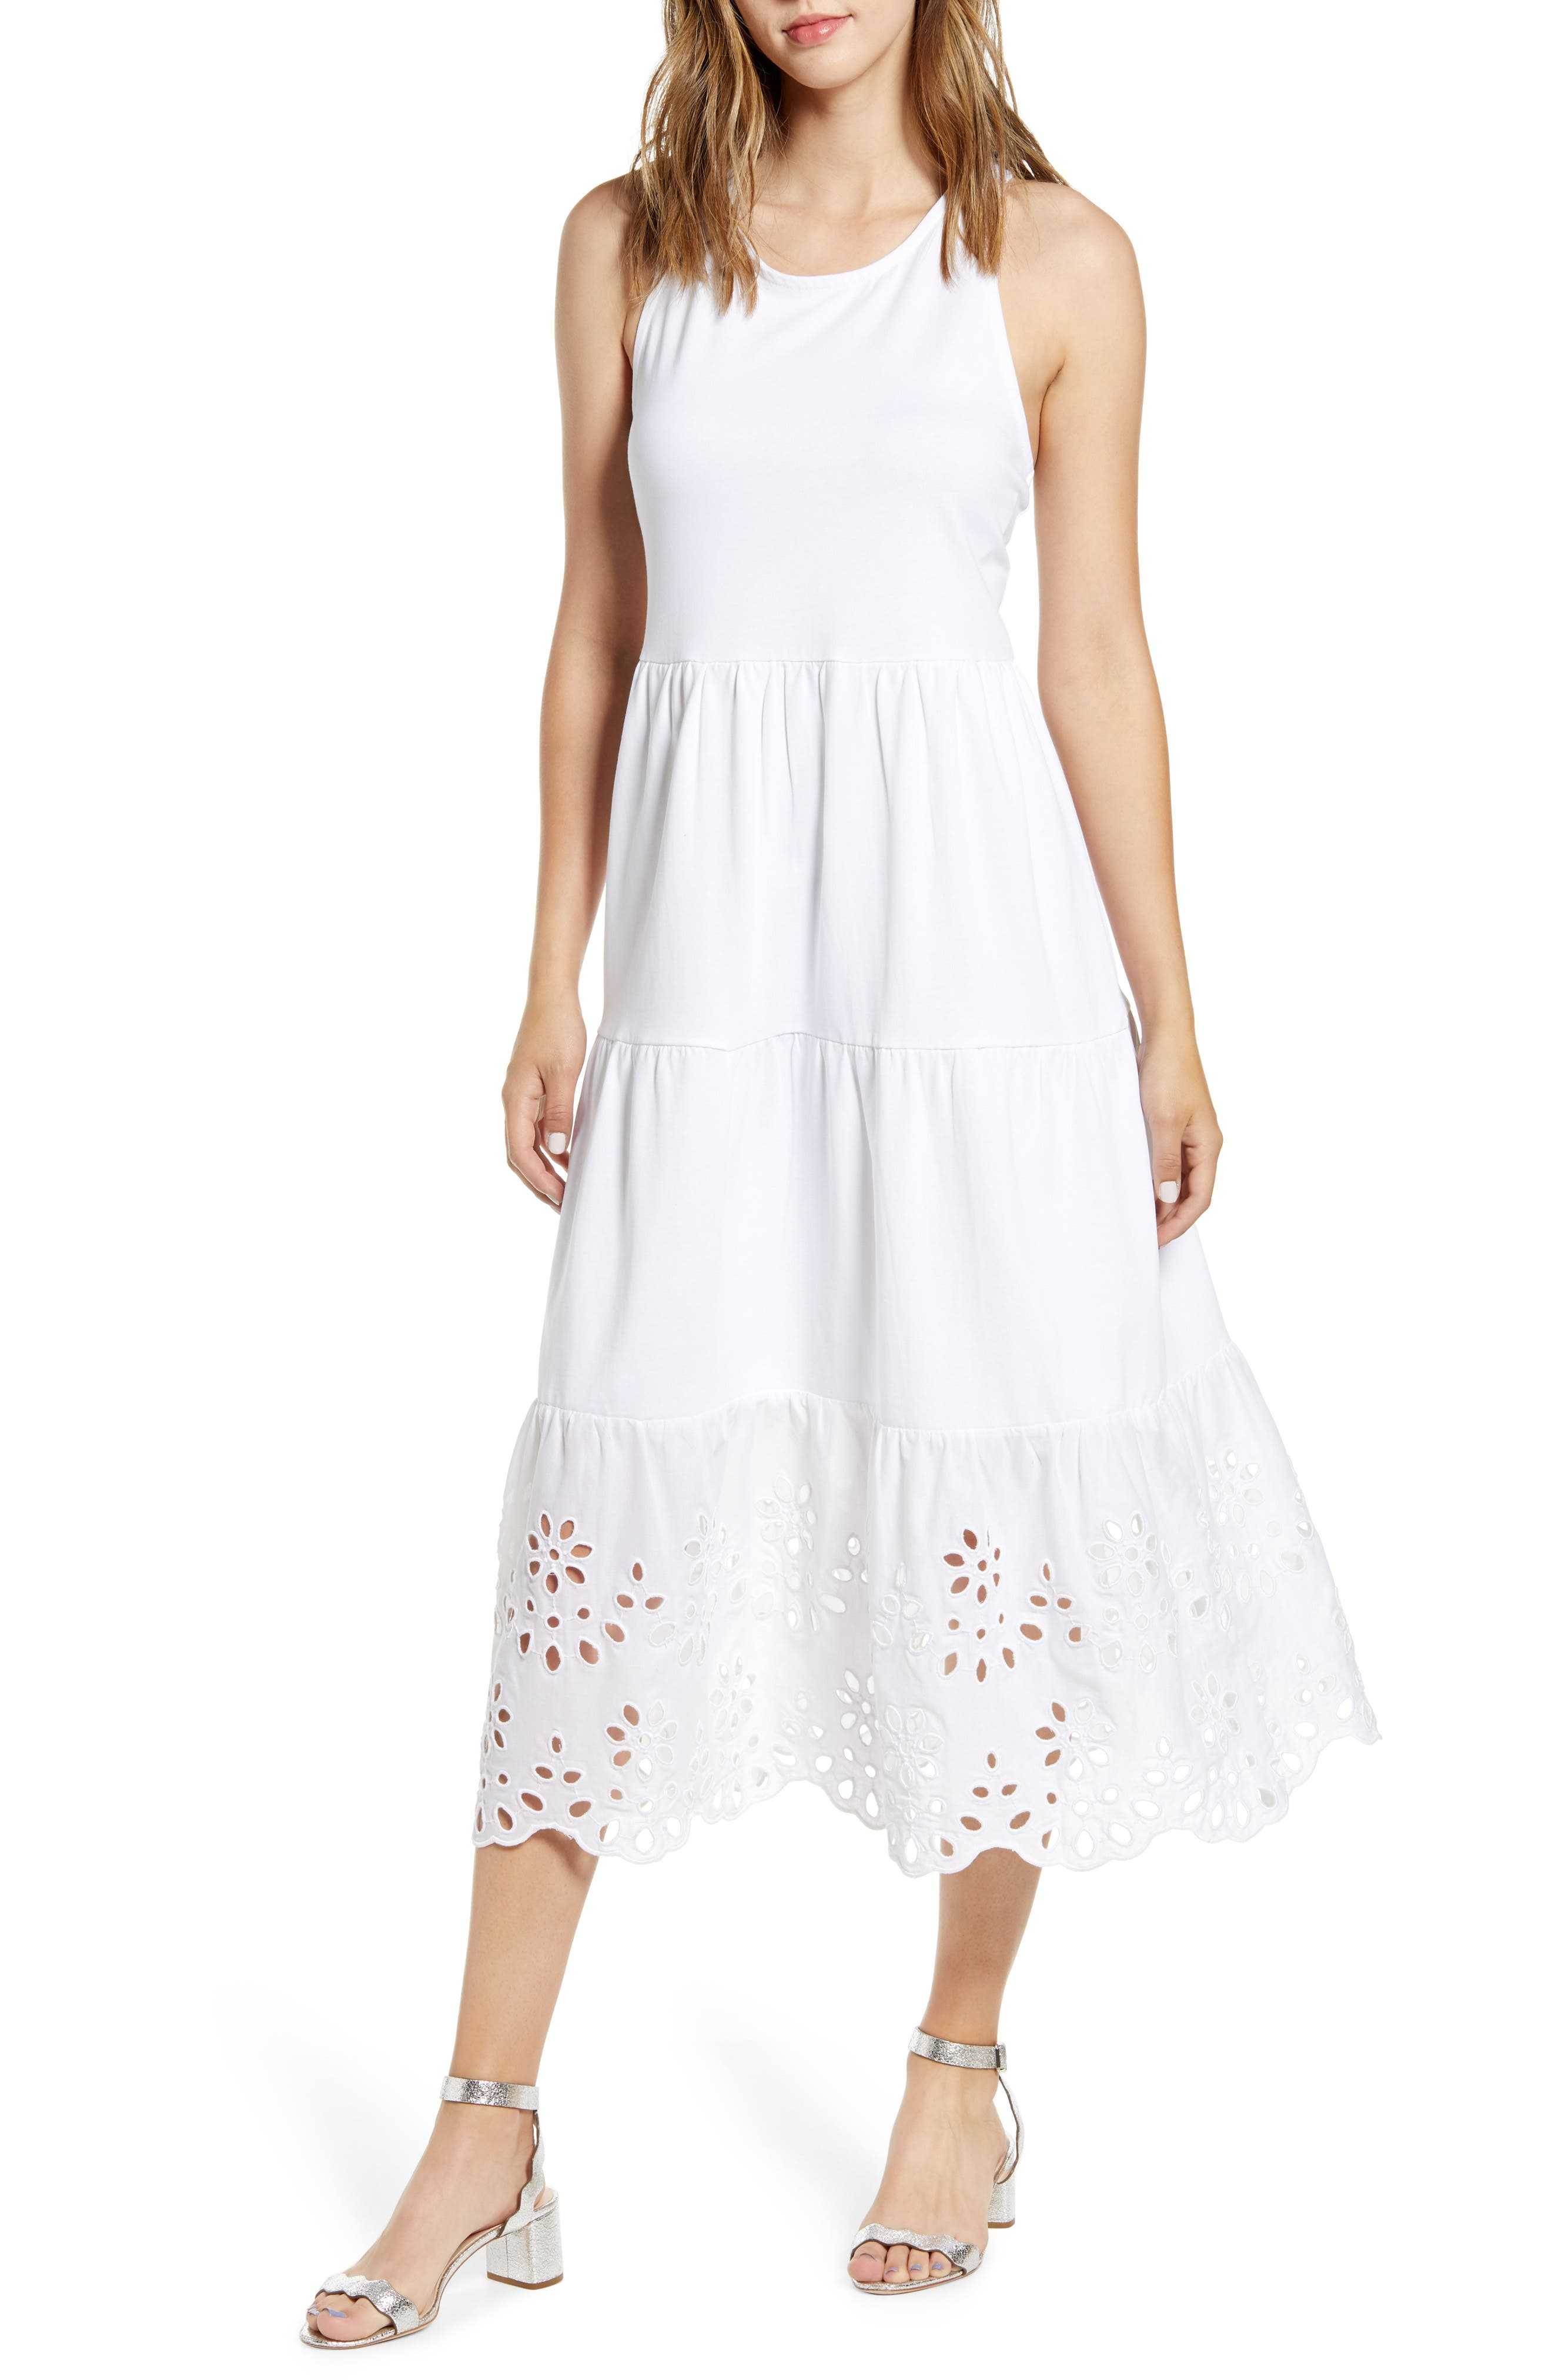 J.crew Eyelet Trim Tiered Knit Maxi Dress, White